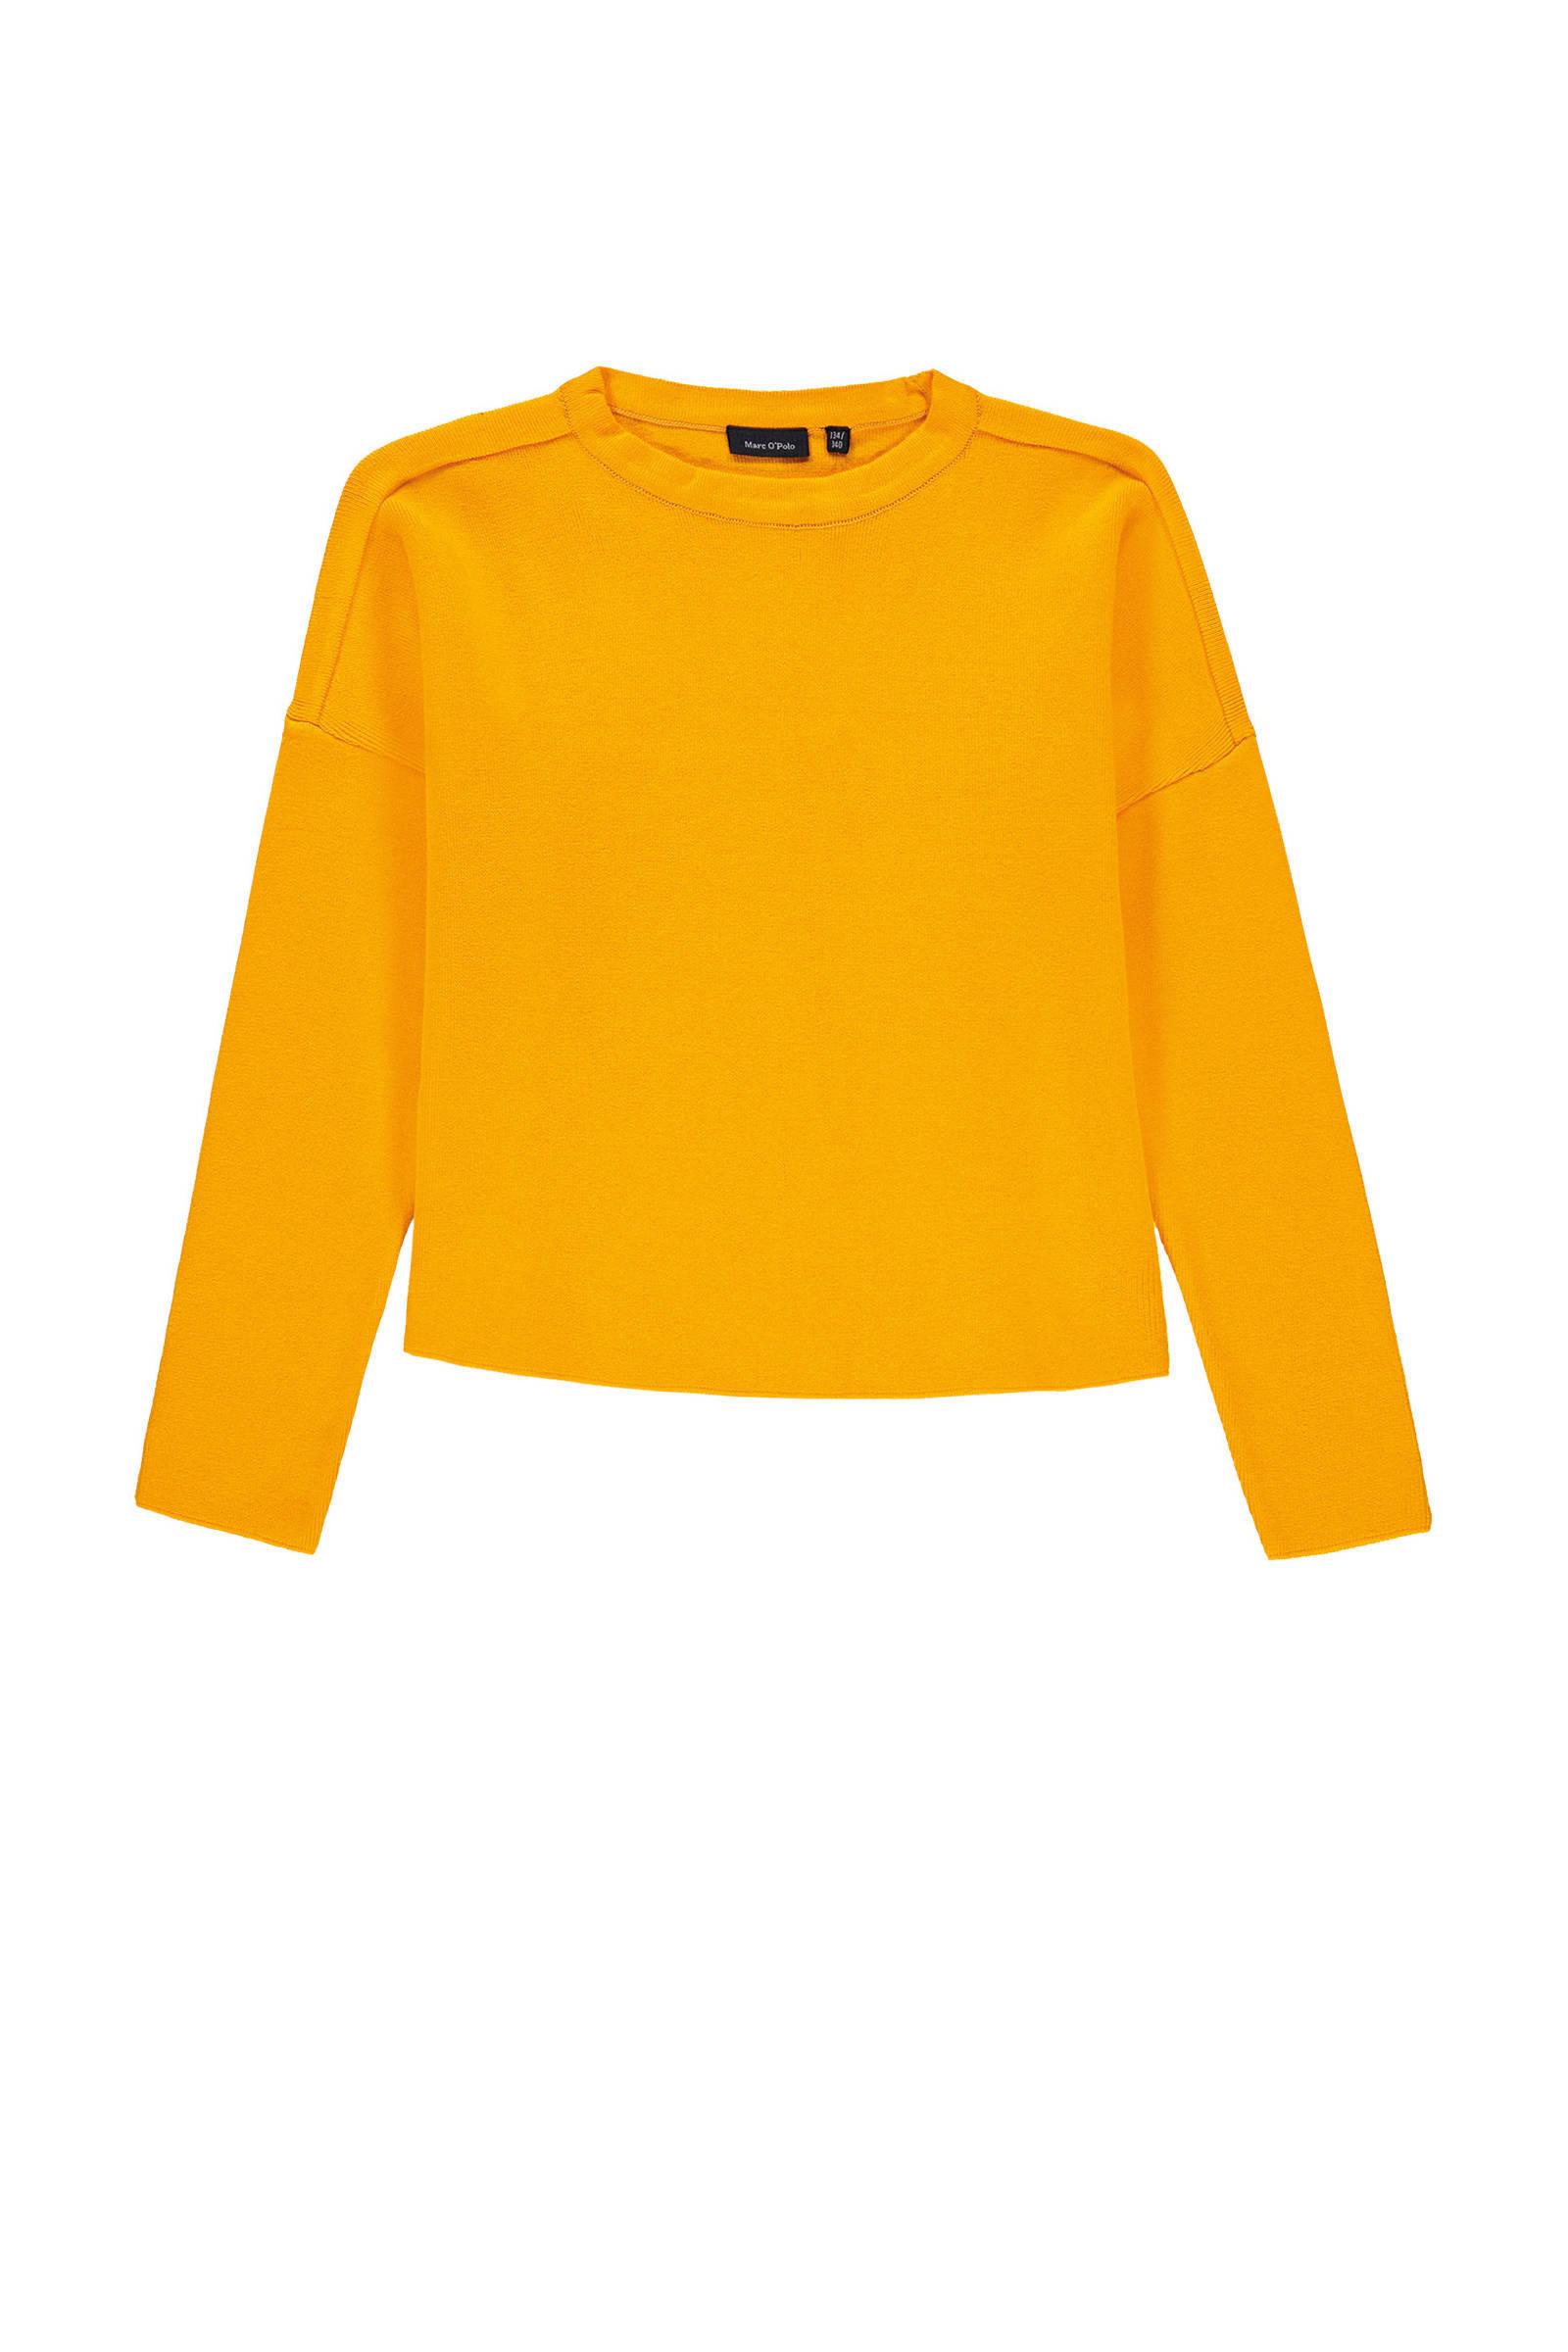 Marc O'Polo trui geel | wehkamp